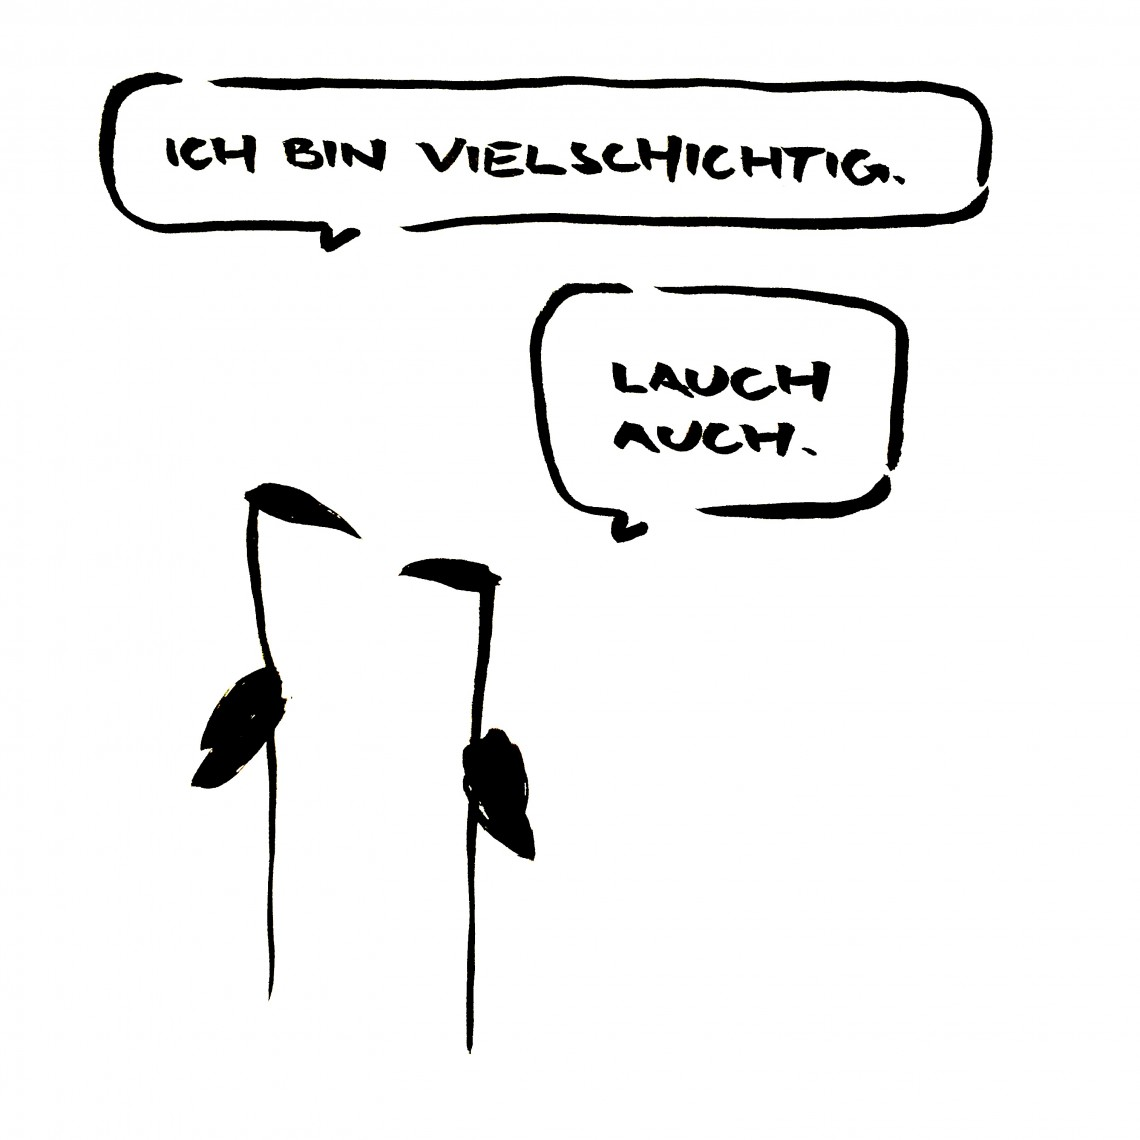 062_lauch